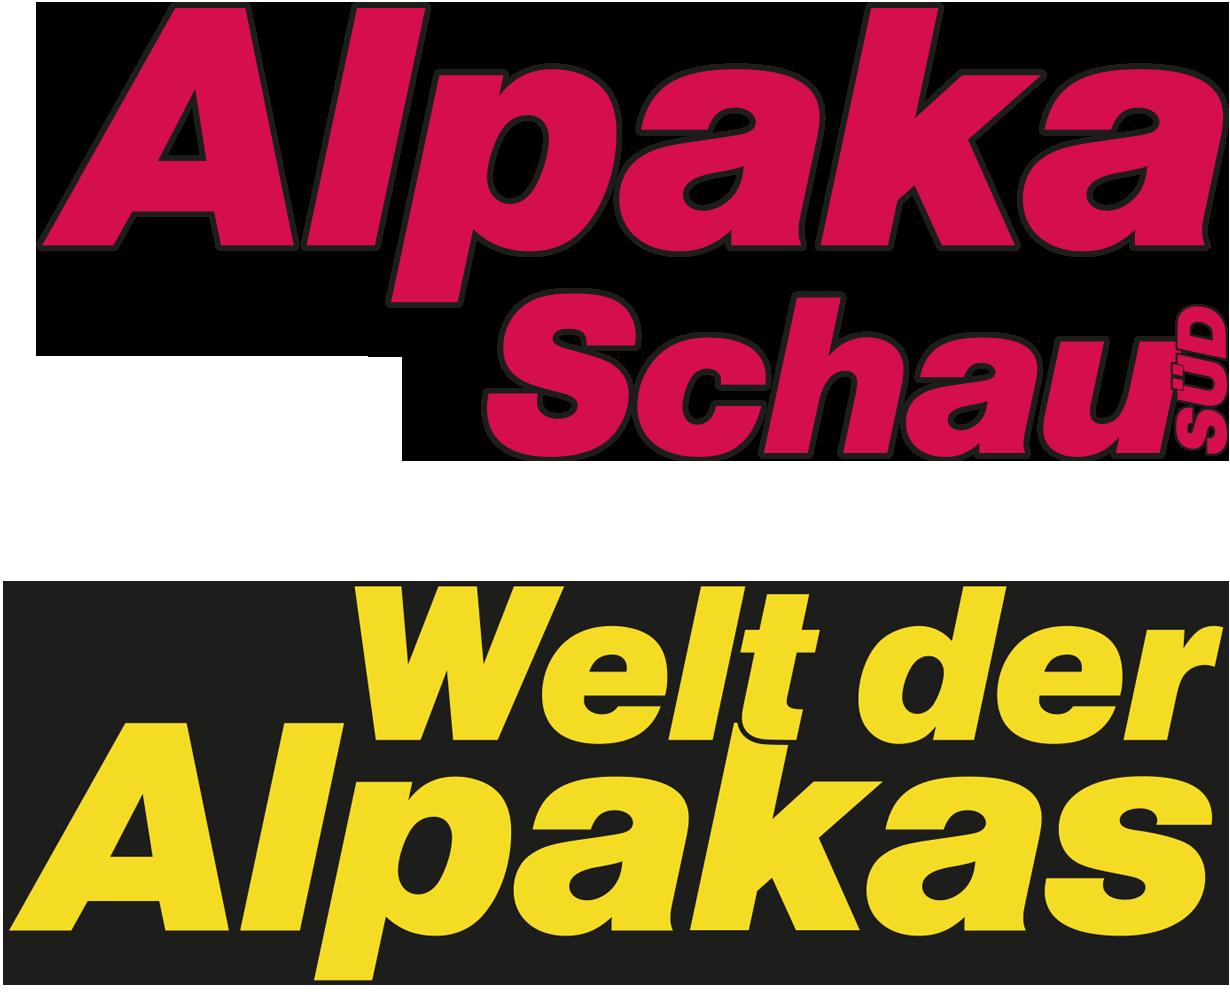 Alpakaschau